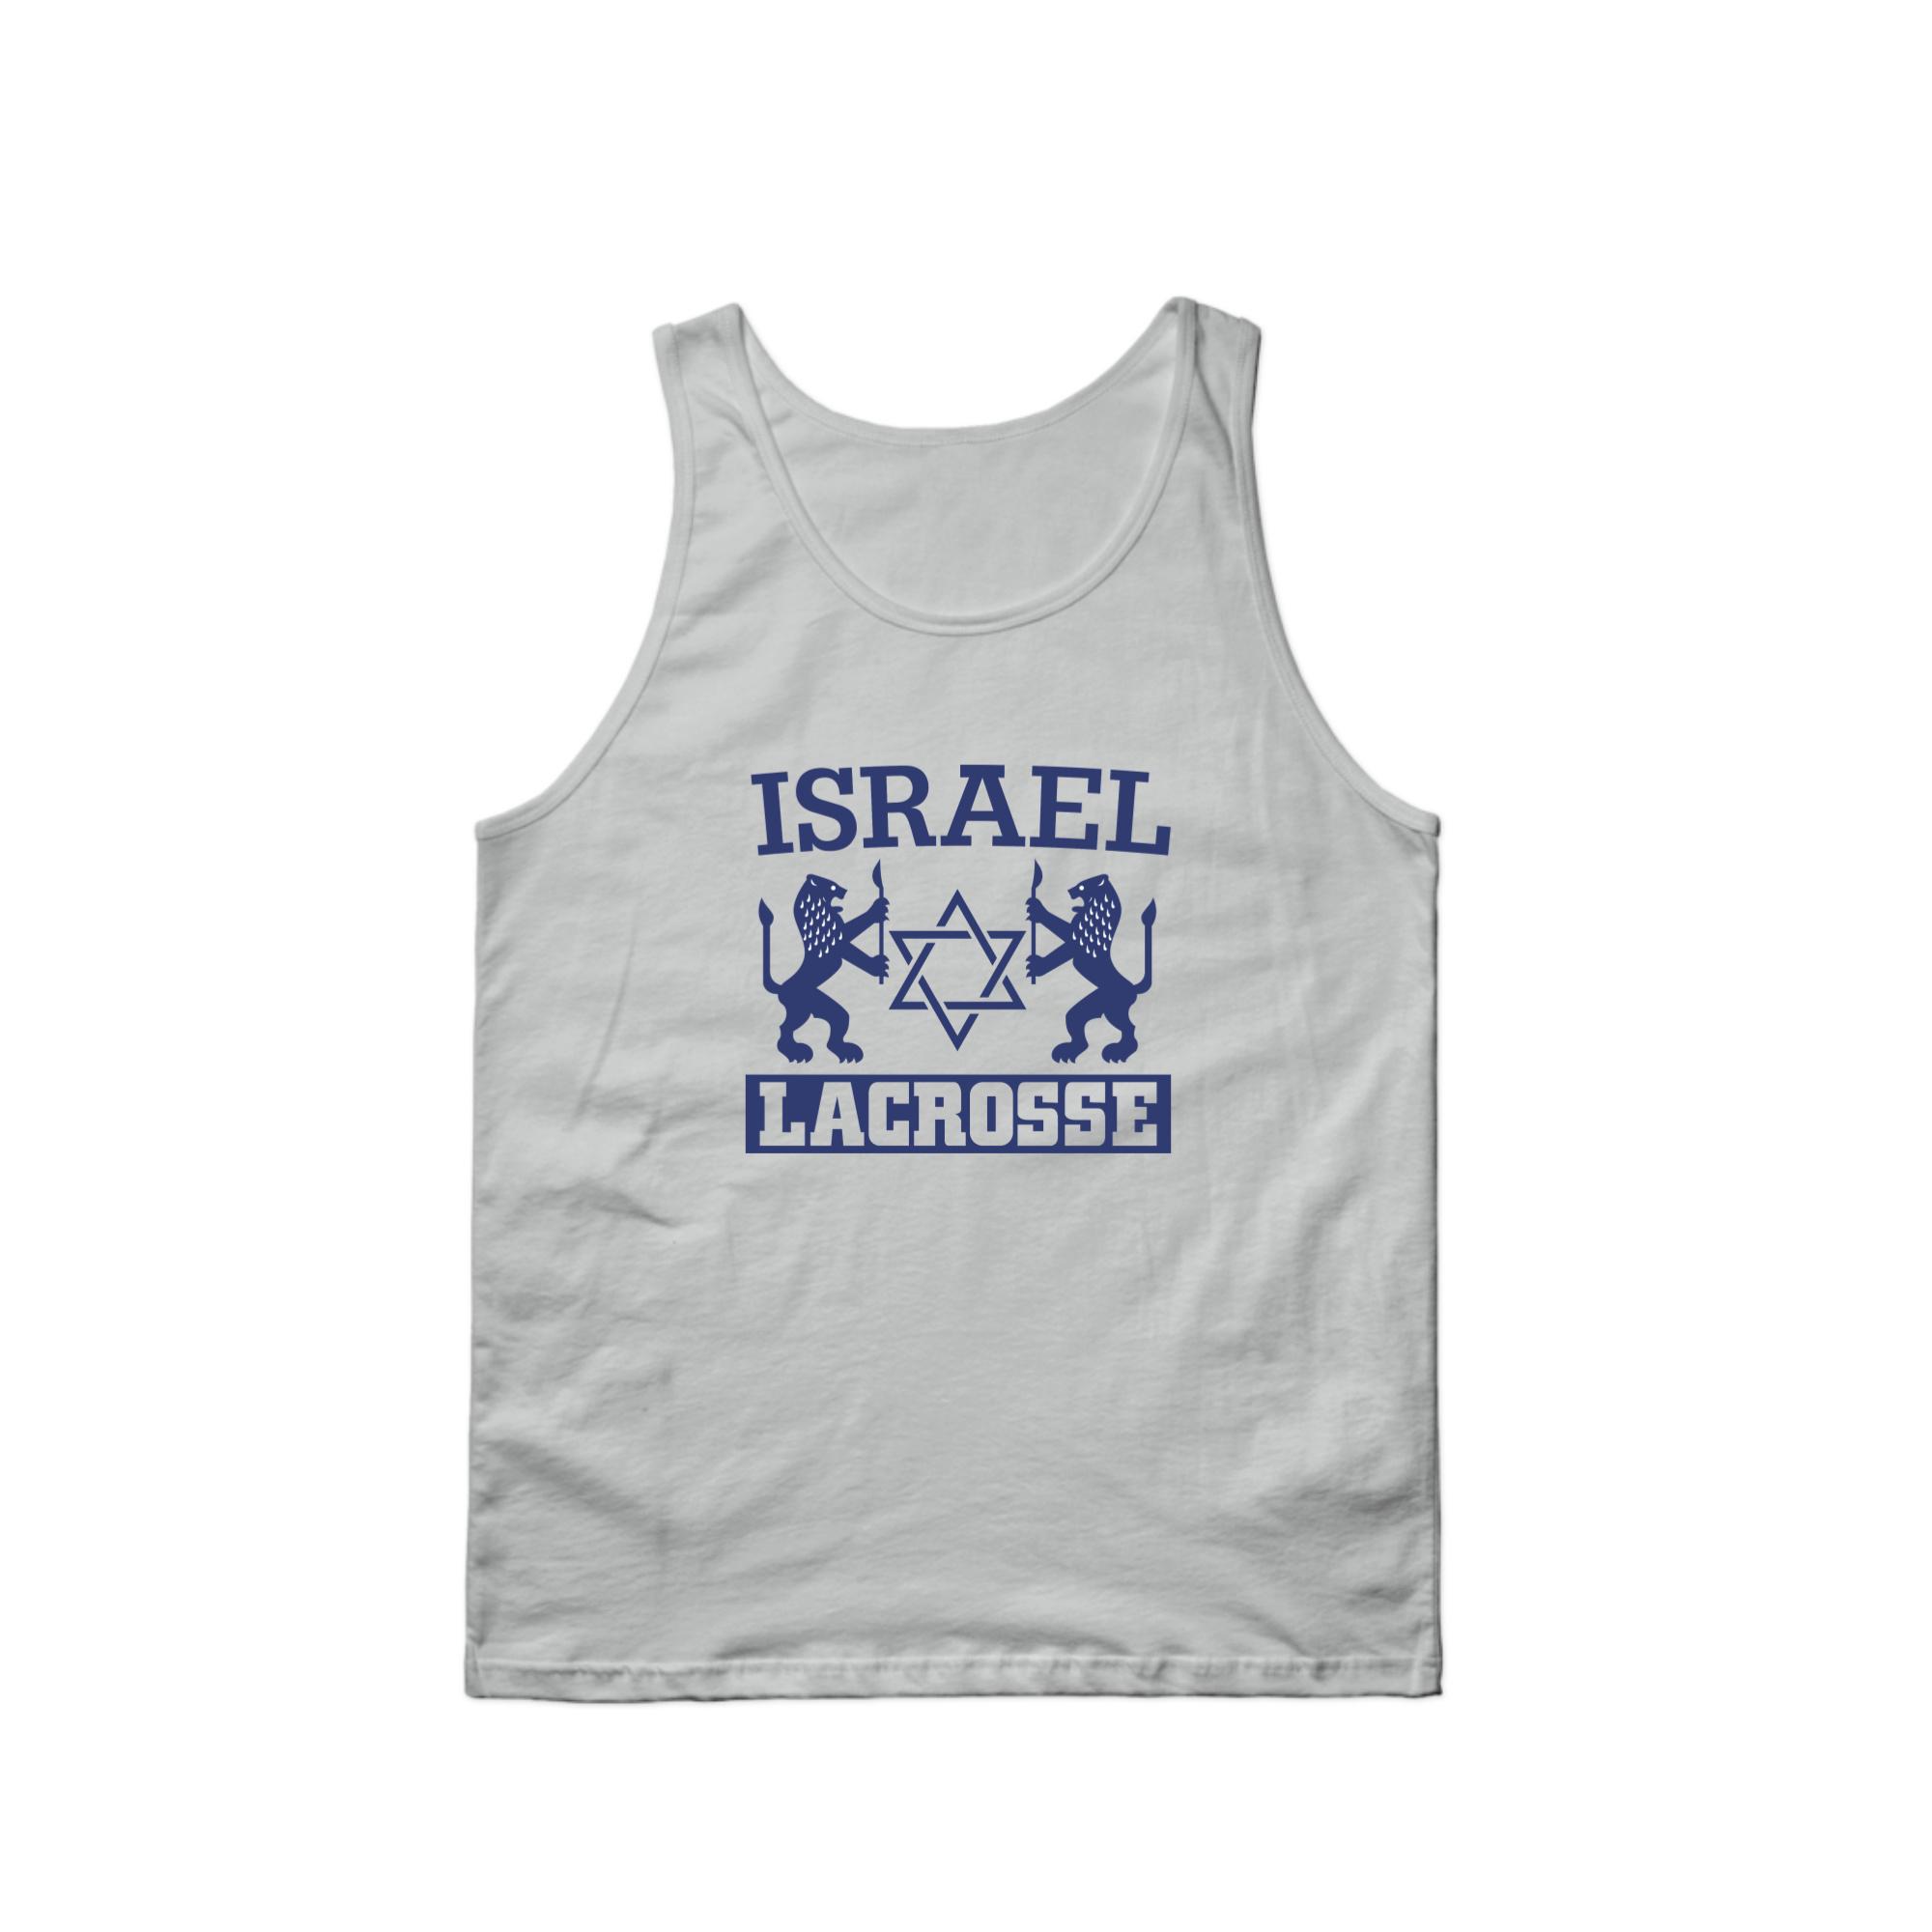 "Israel Lacrosse ""Lions"" Tank"